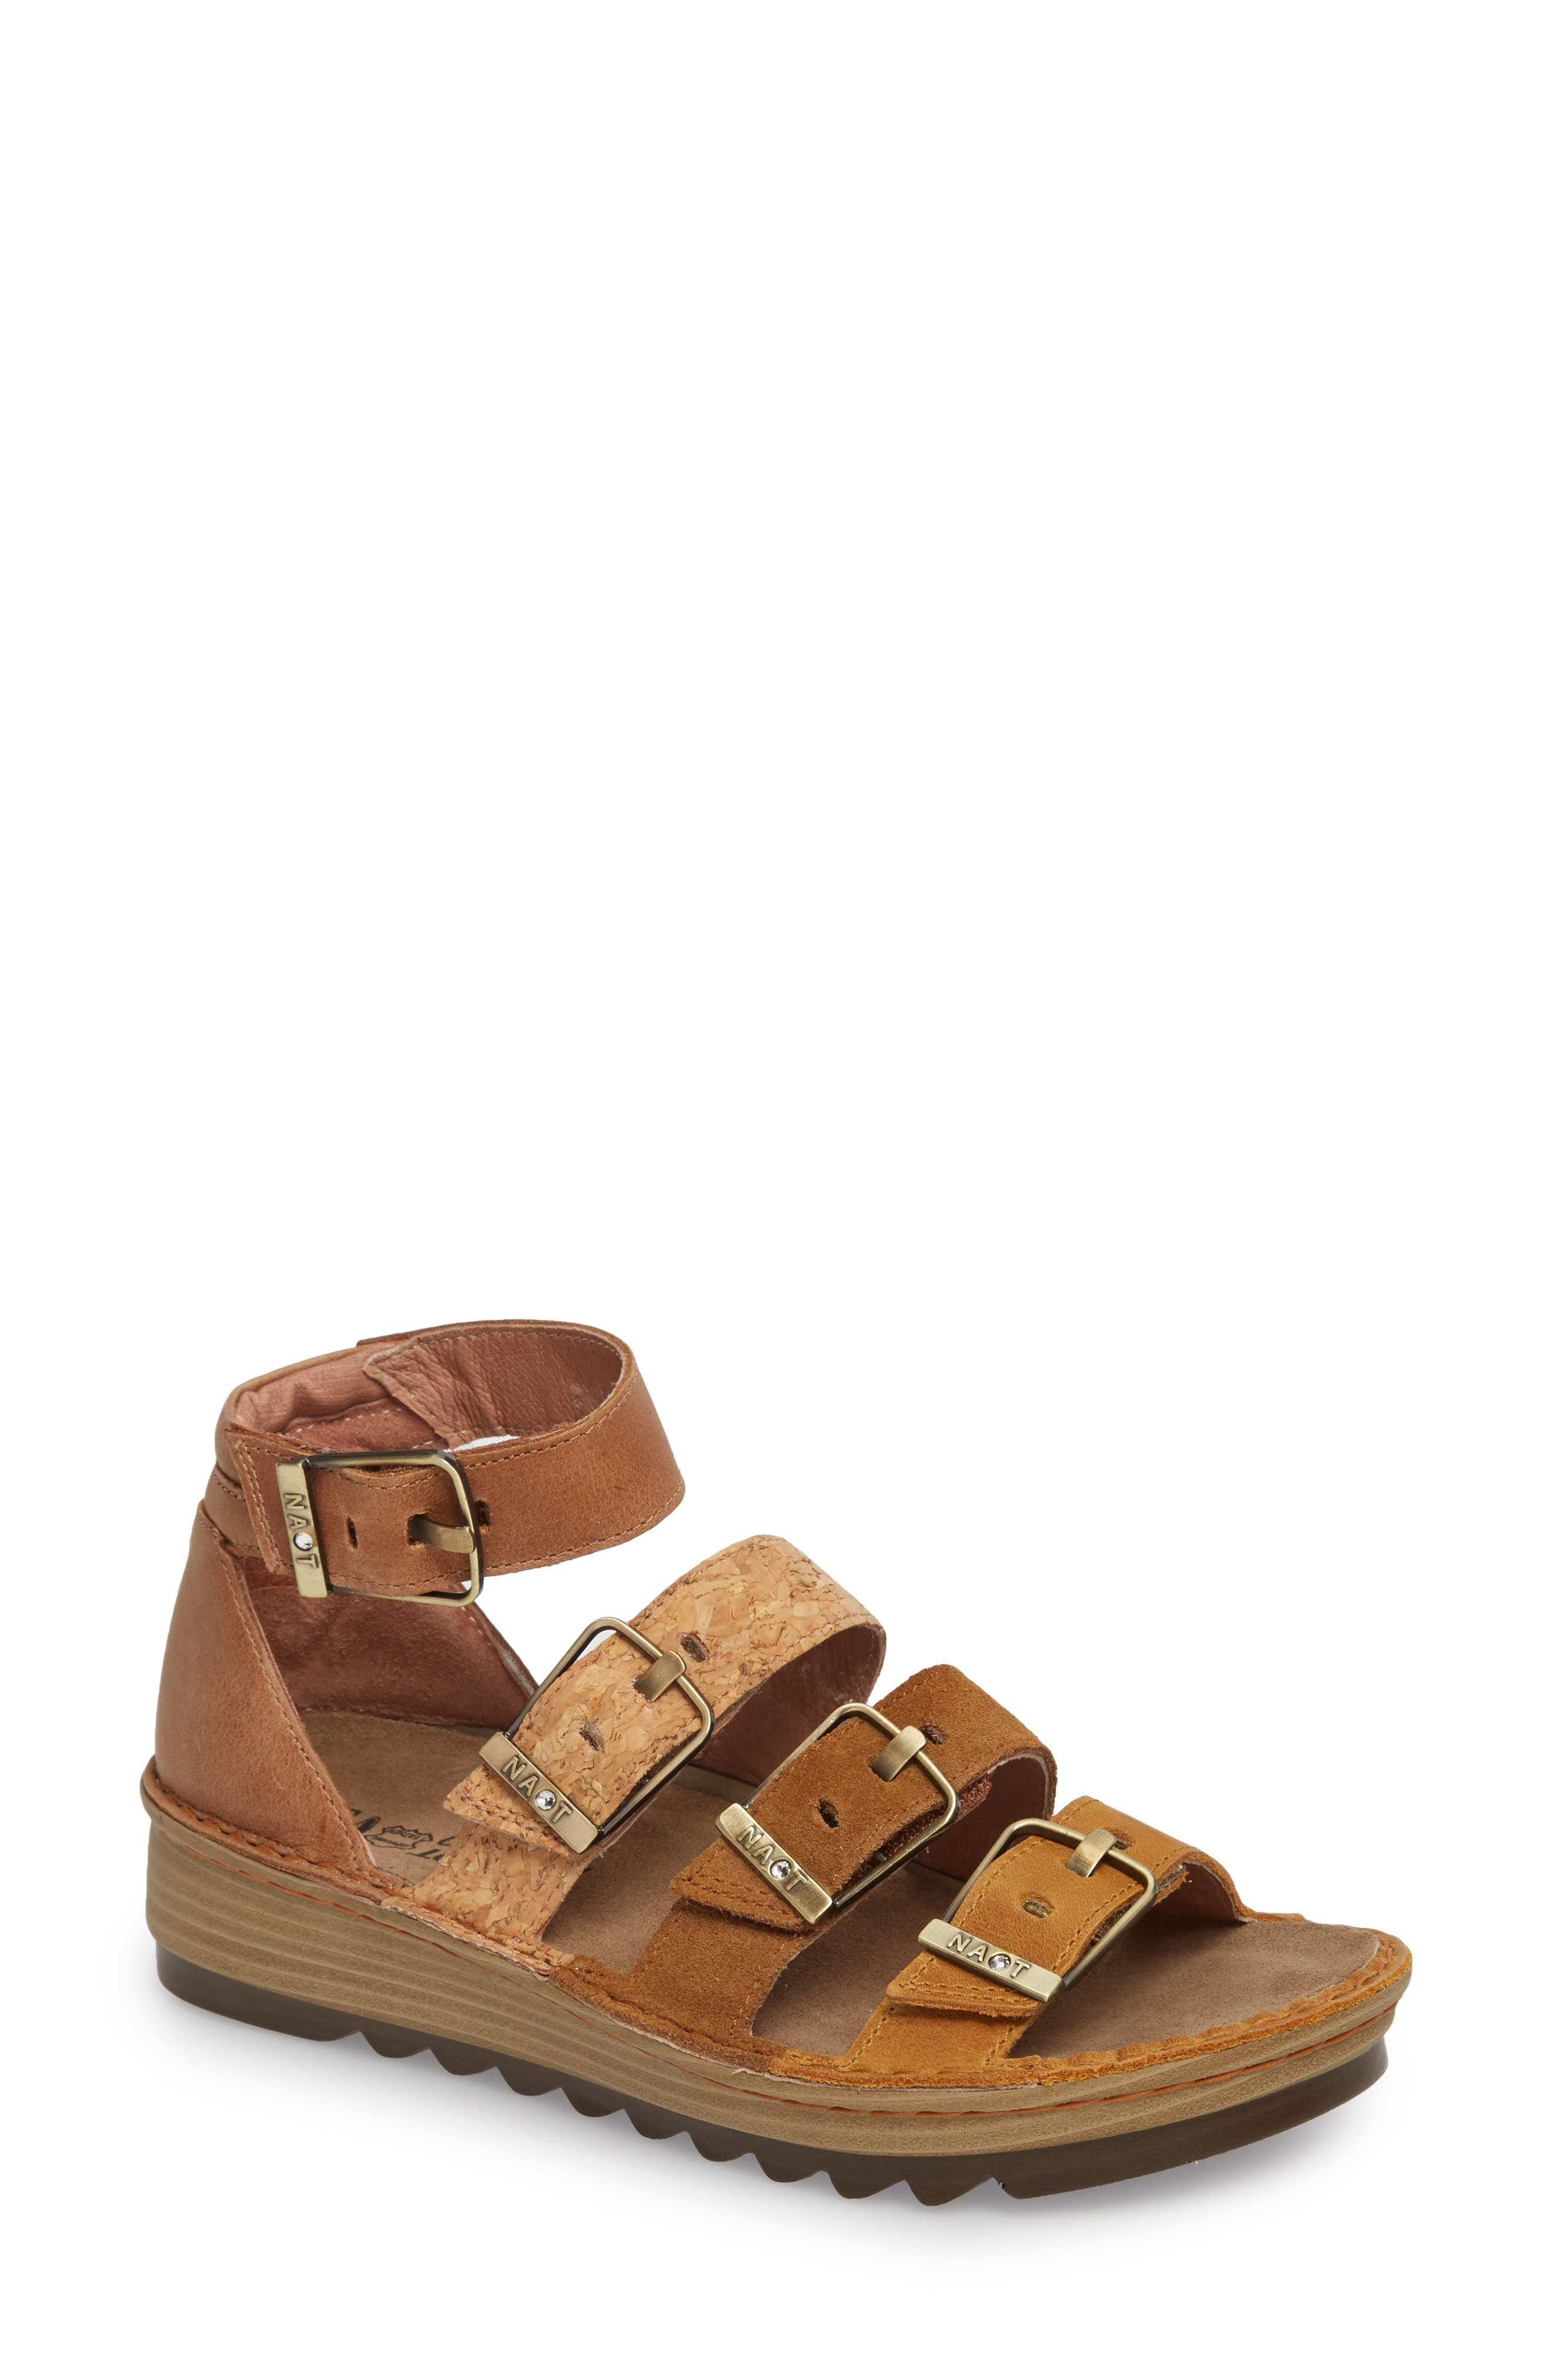 'Begonia' Sandal,                         Main,                         color, OILY DUNE NUBUCK